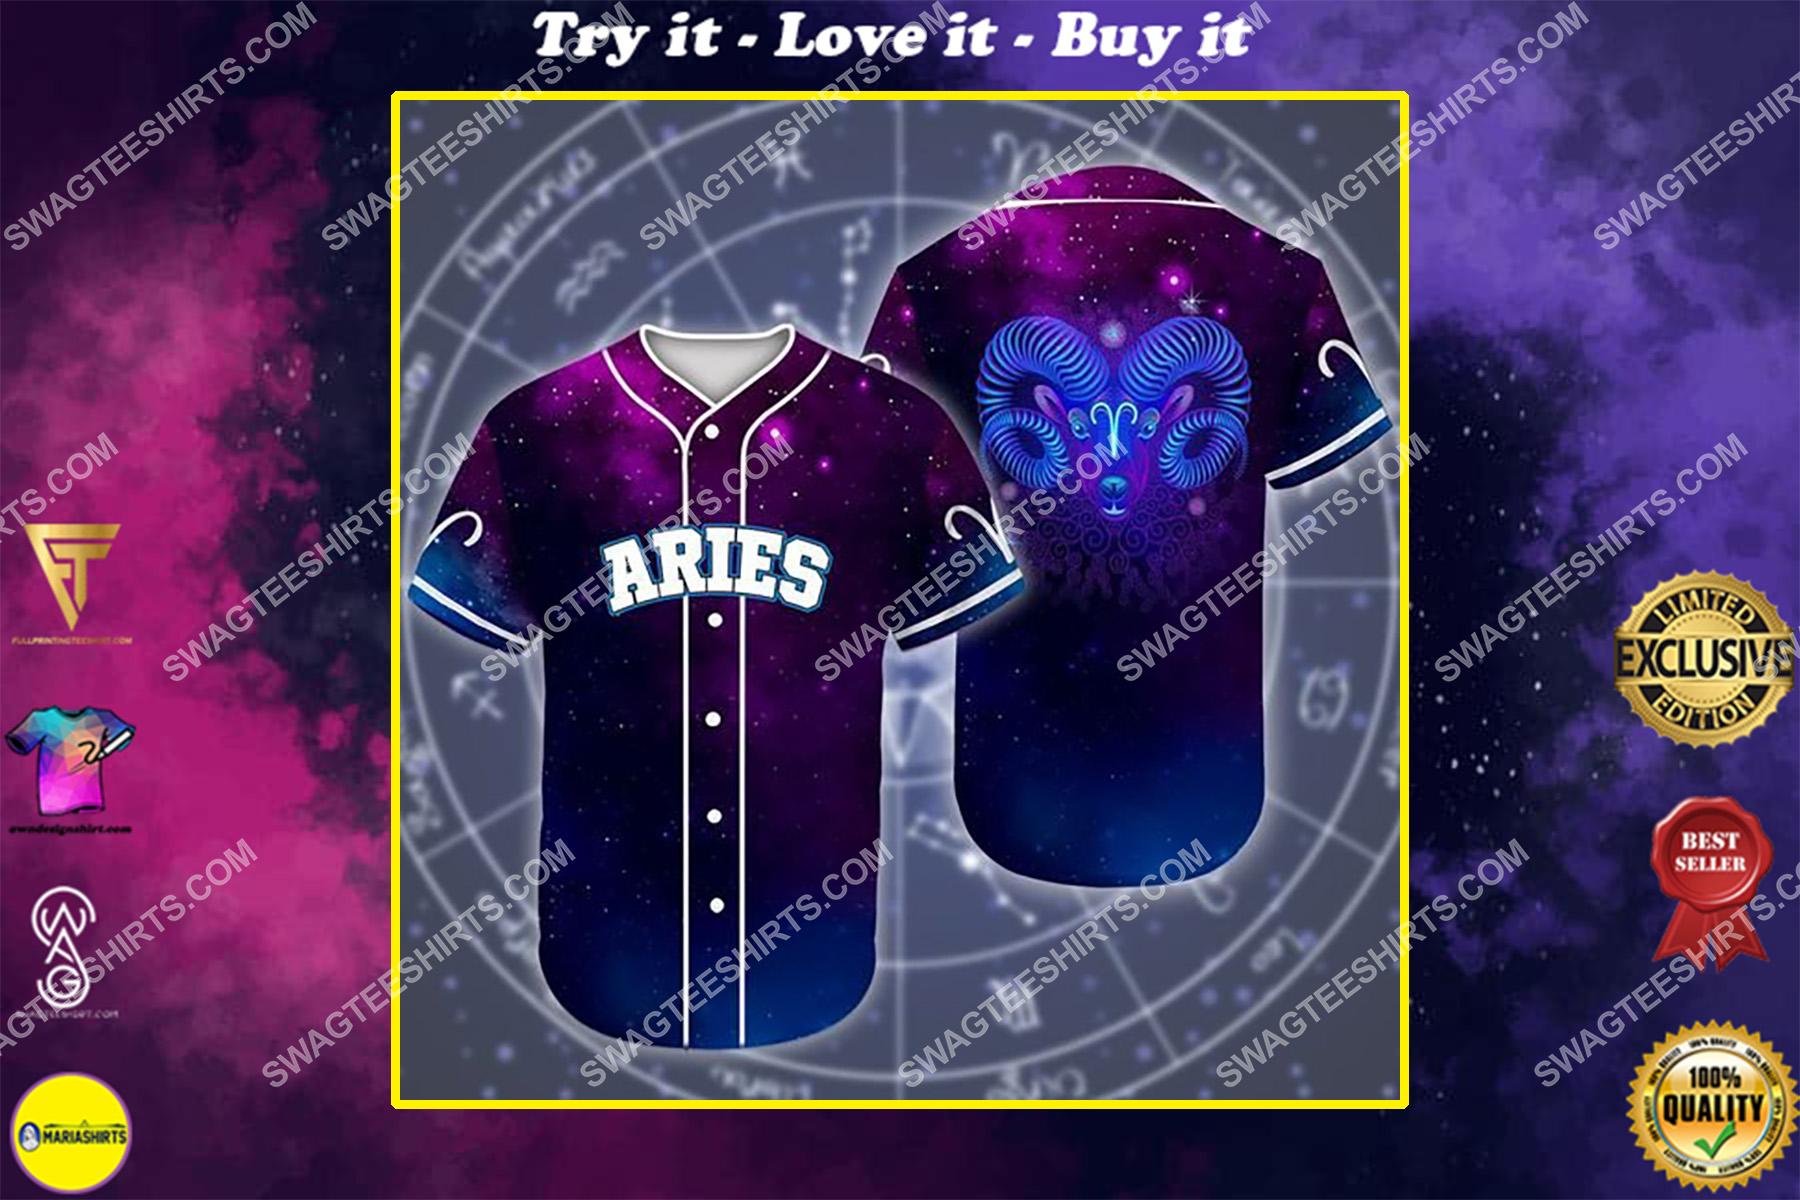 aries galaxy zodiac all over printed baseball shirt